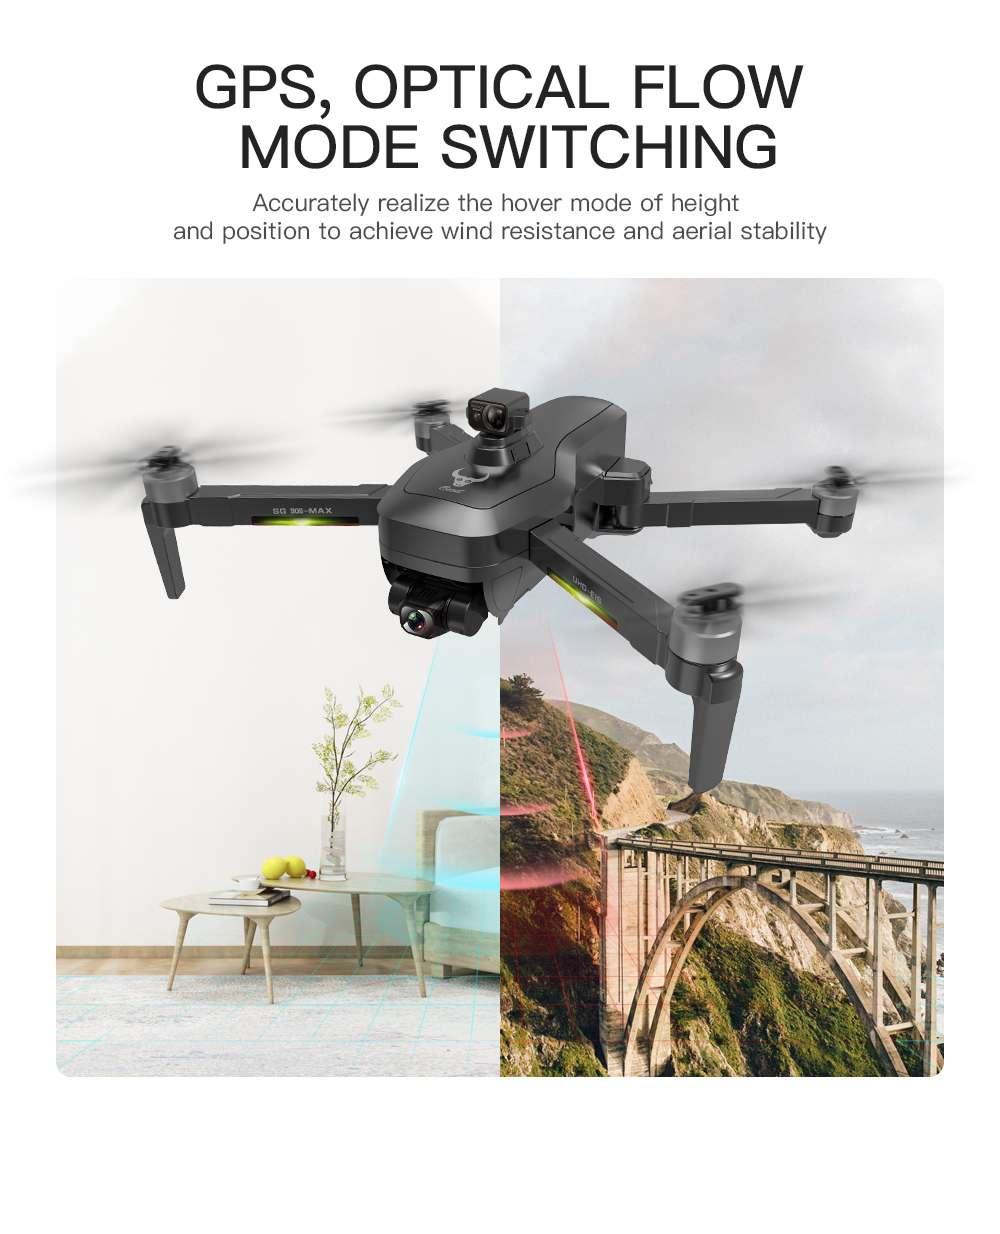 ZLRC SG906 PRO складной Дрон Zenfone 3 MAX GPS 5G WI-FI с видом от первого лица с разрешением 4K HD Камера 3-осевой EIS Anti-shake Gimbal обходом препятствий Квадрокоптер